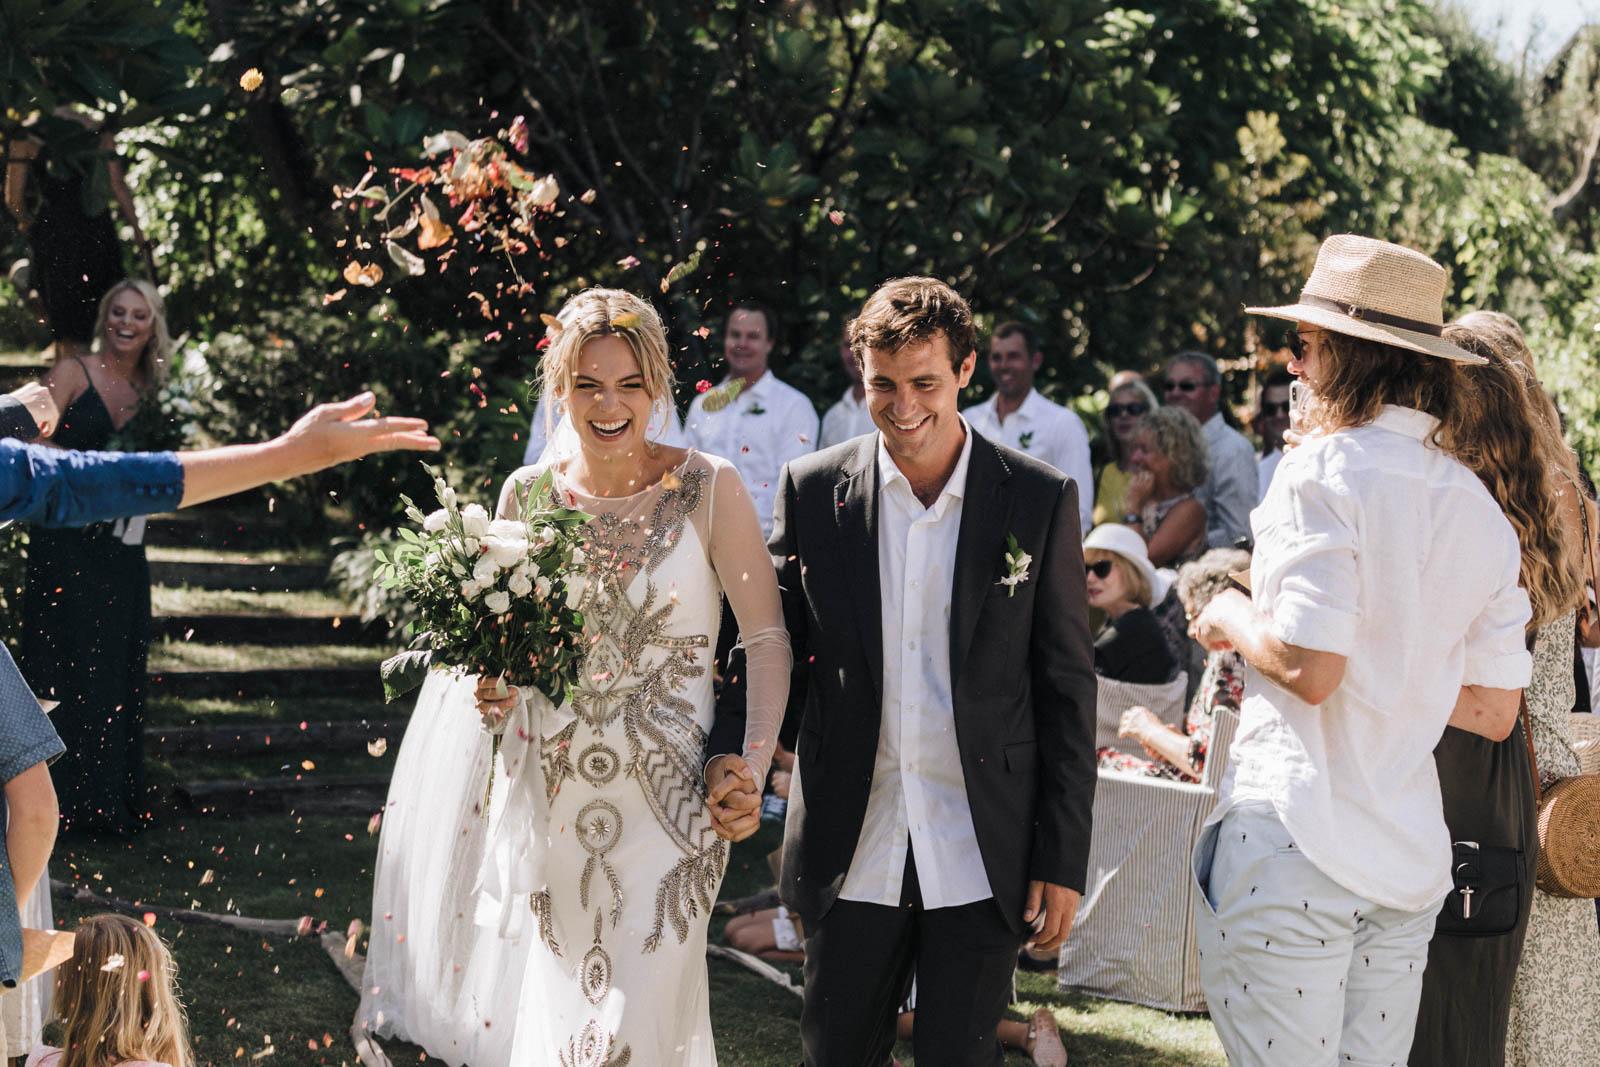 newfound-l-i-coromandel-wedding-photographer-1617-A9_03141